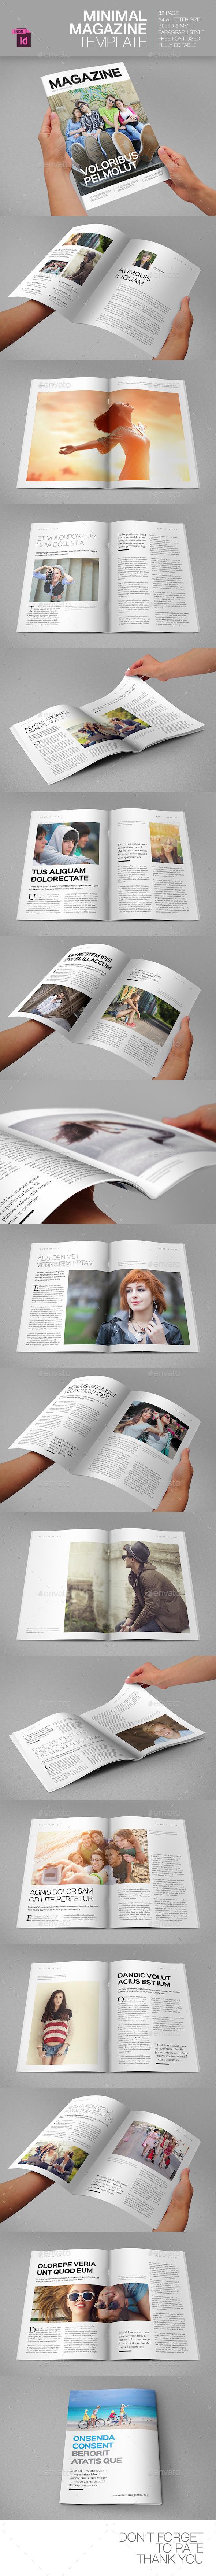 GraphicRiver Minimal Magazine Template 9031451